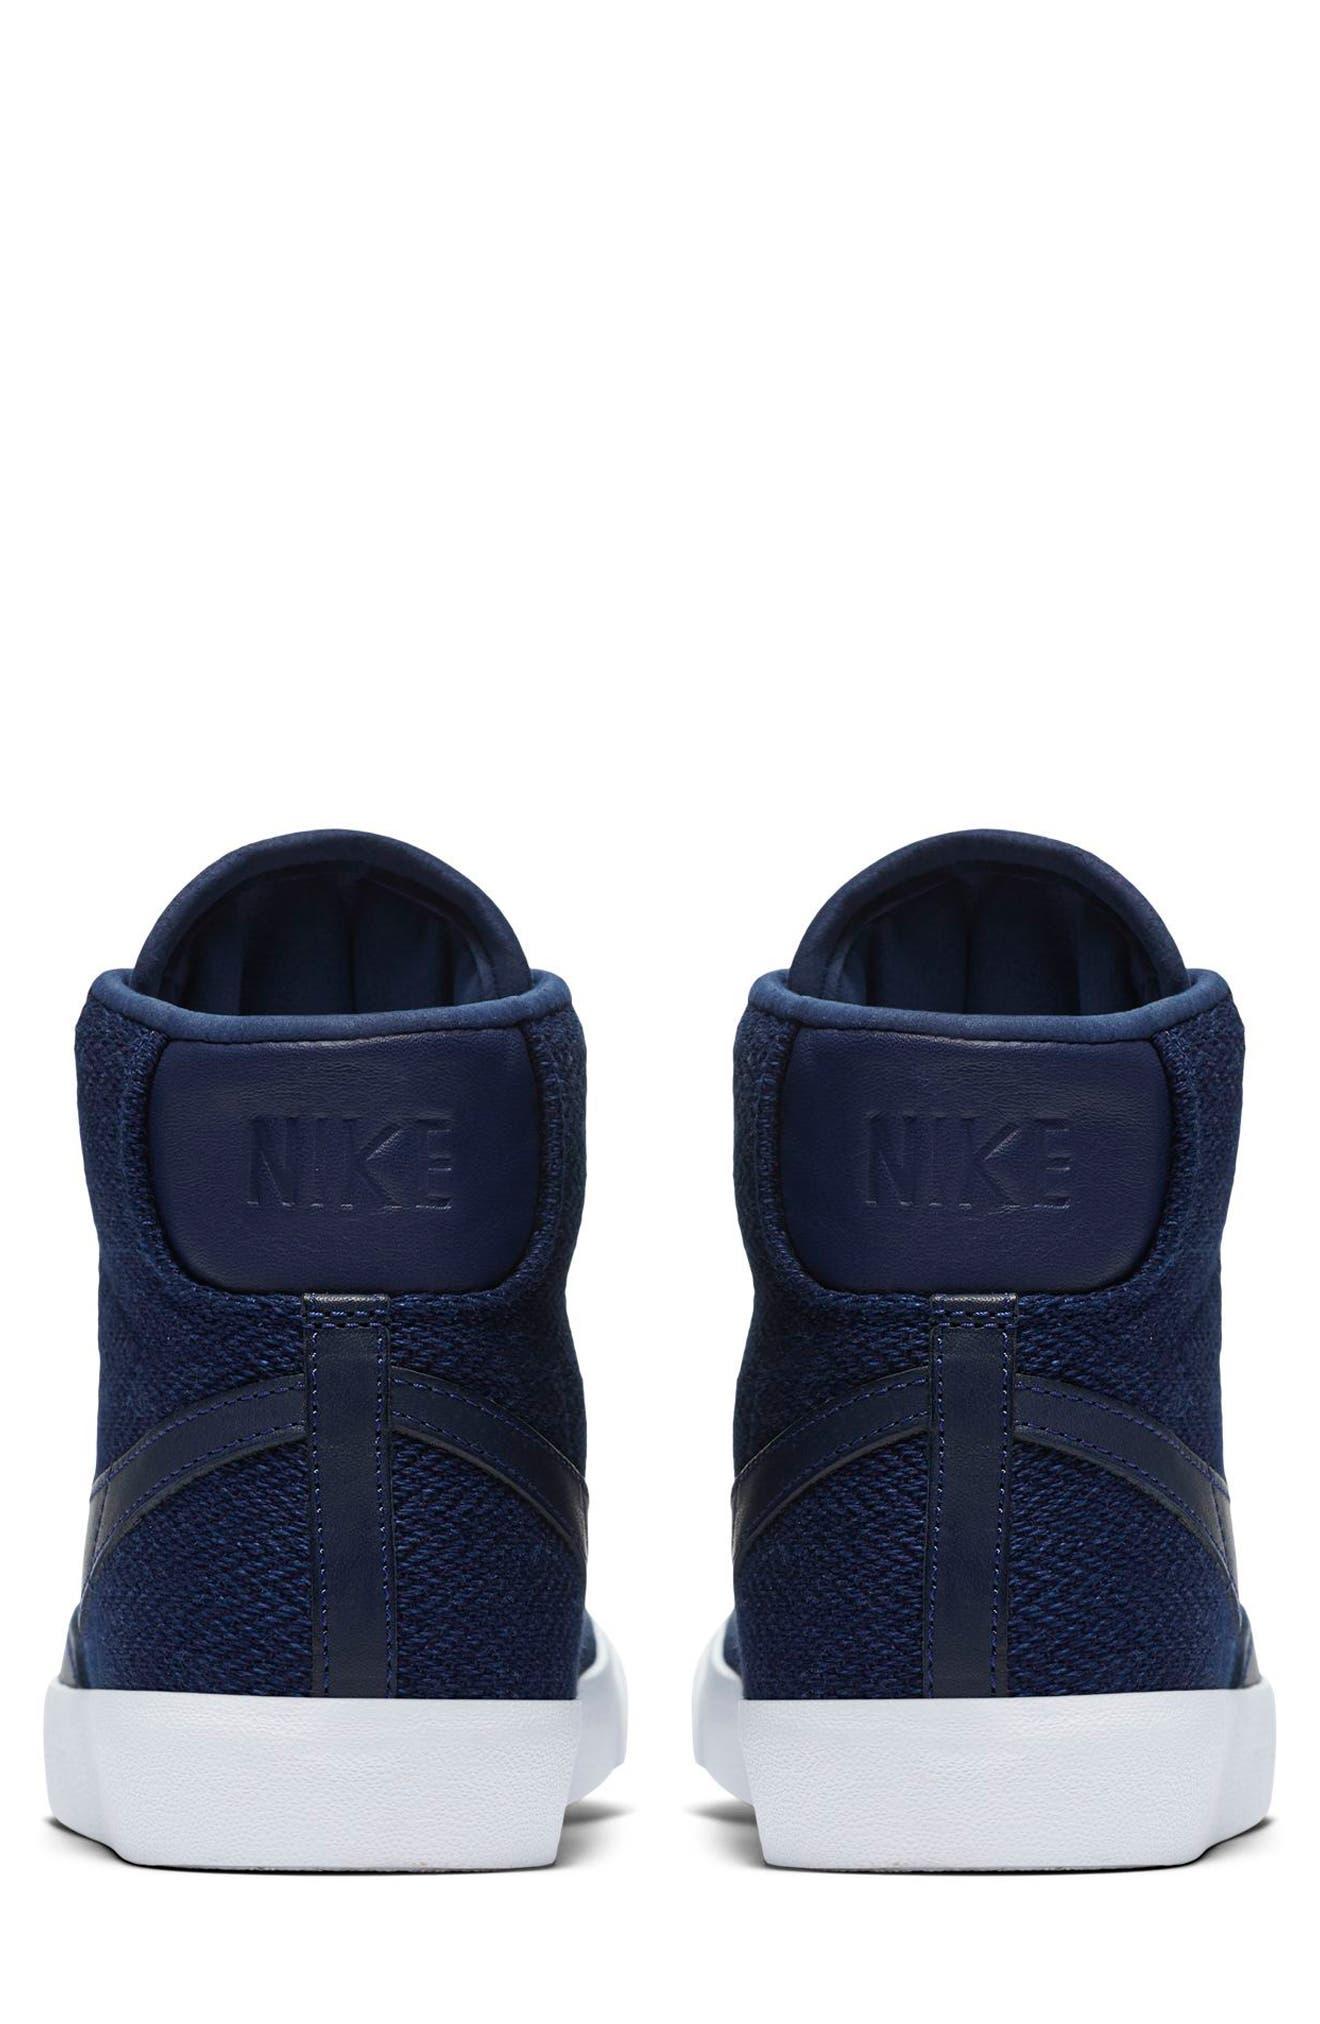 Blazer Mid Premium LX Sneaker,                             Alternate thumbnail 2, color,                             400